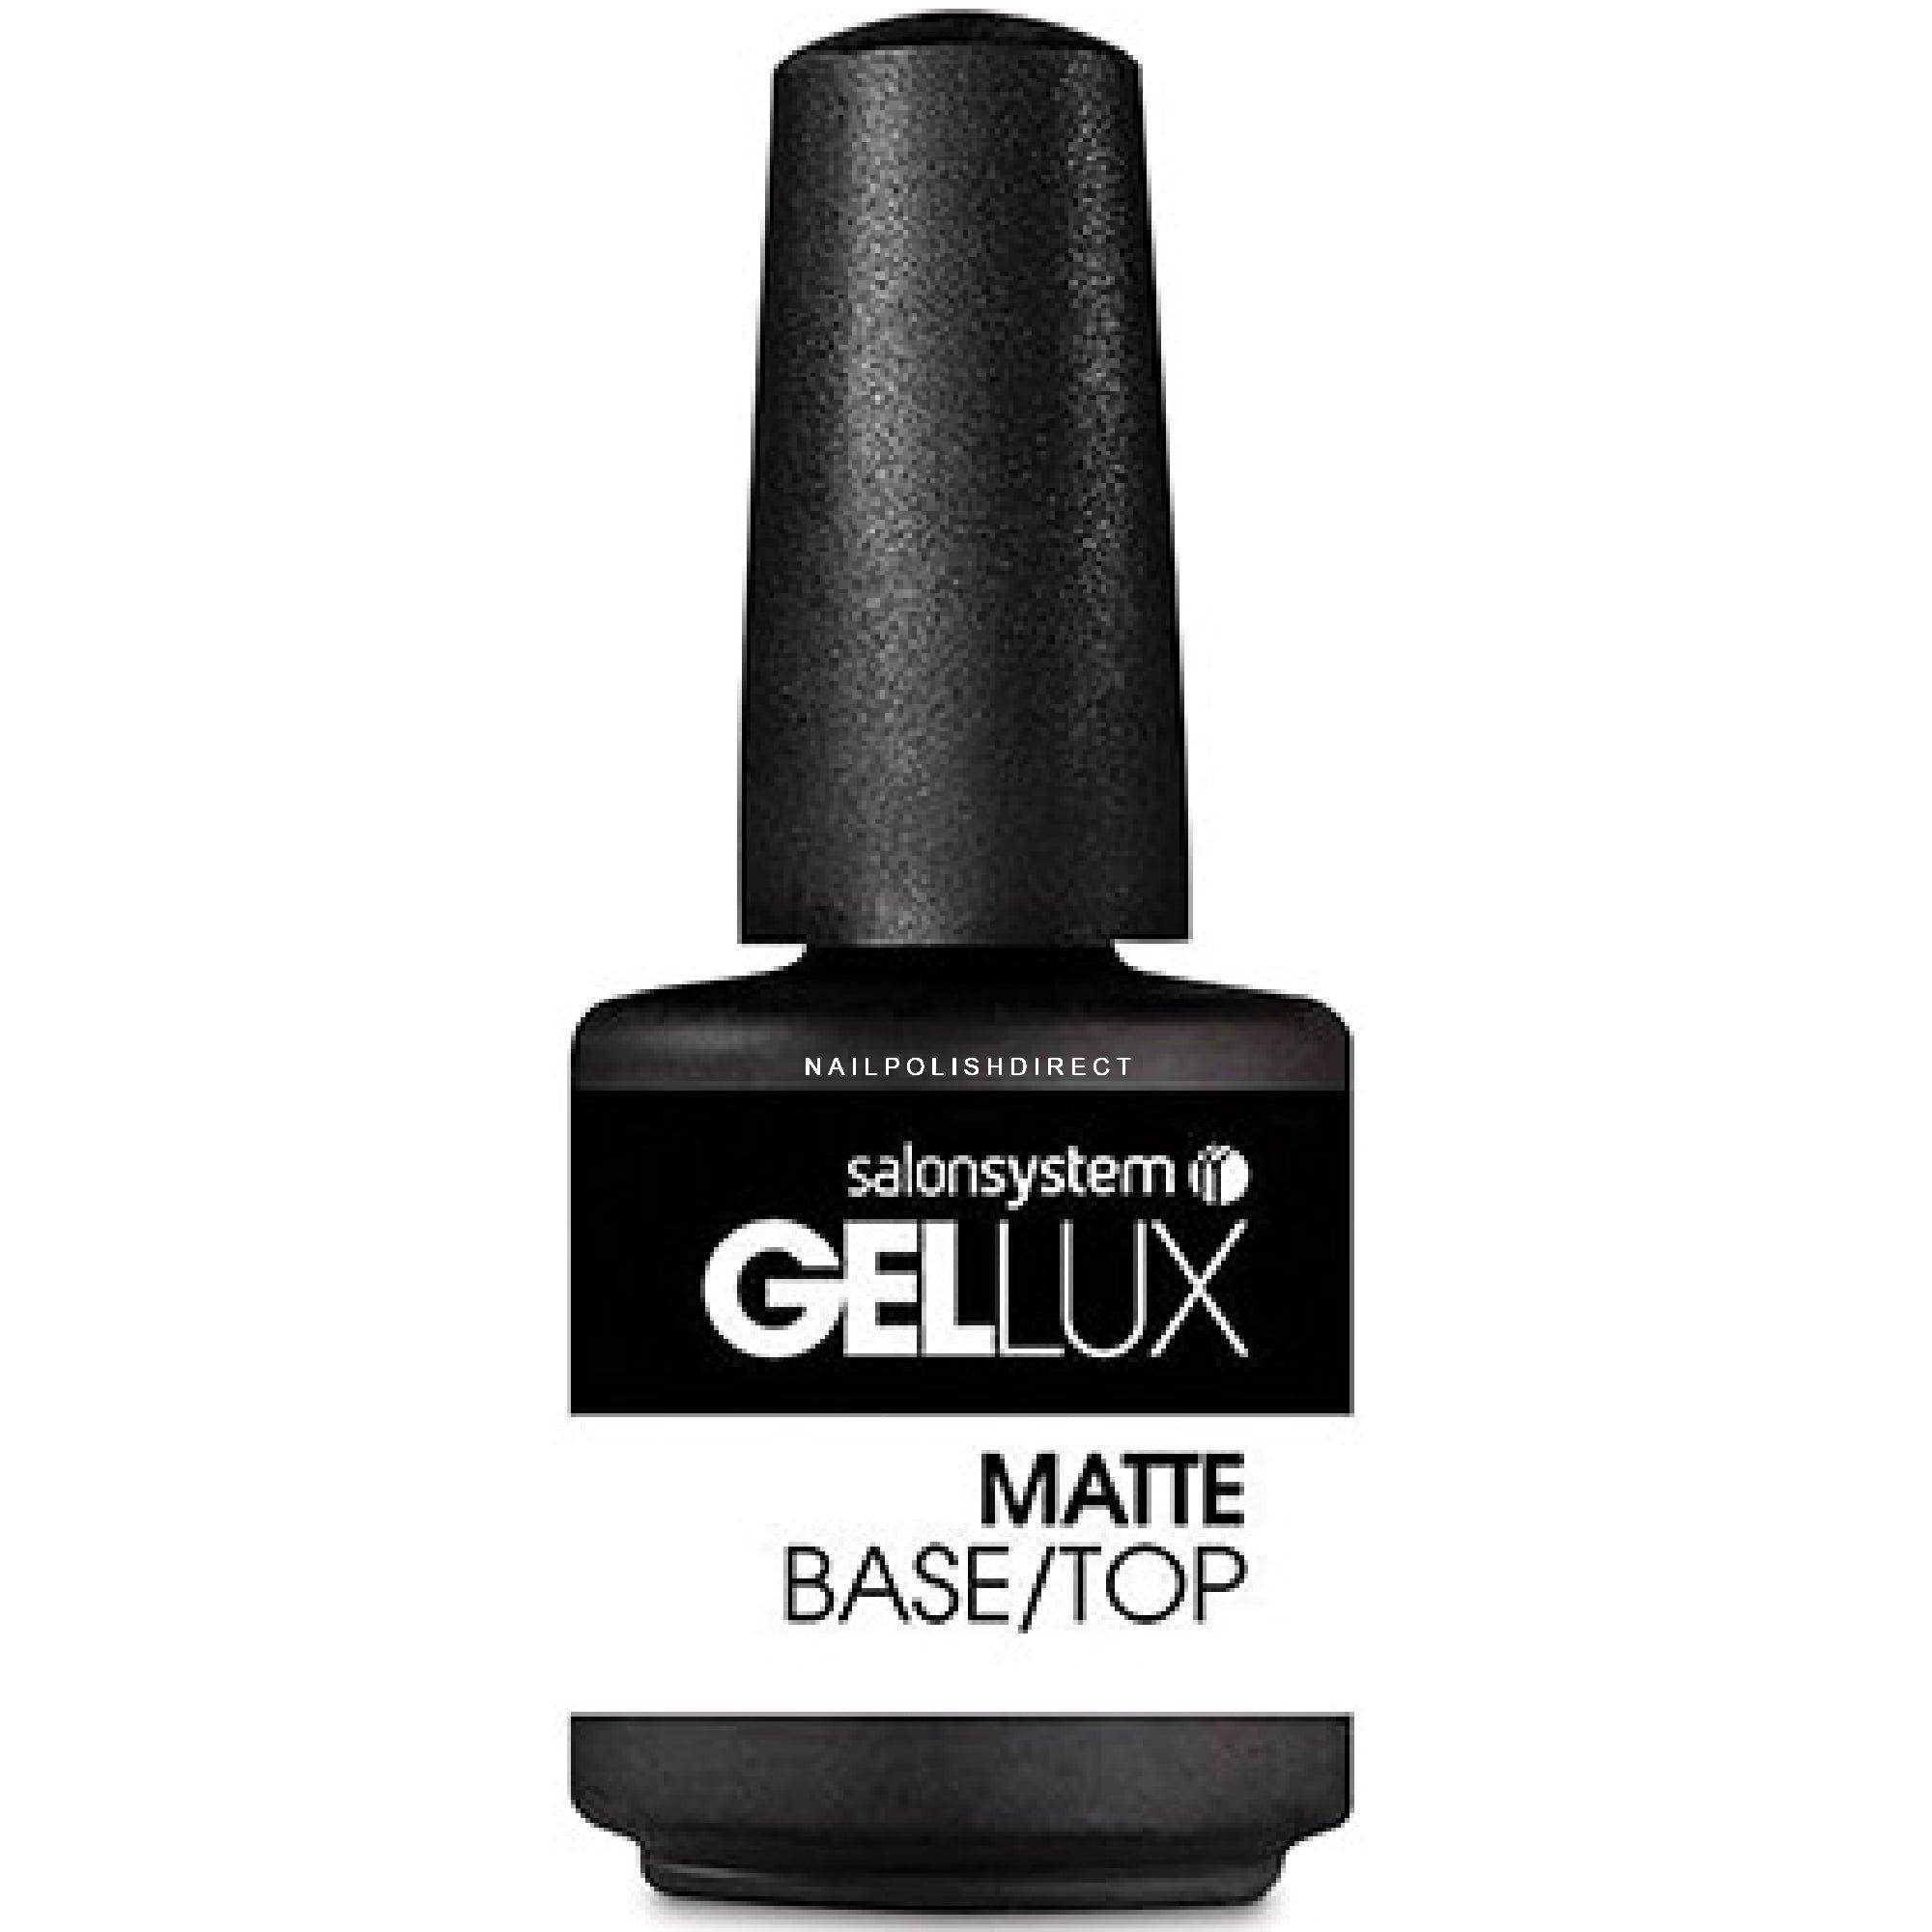 Gellux Professional Gel Nail Polish - Matte Base/Top (12982) 15ml